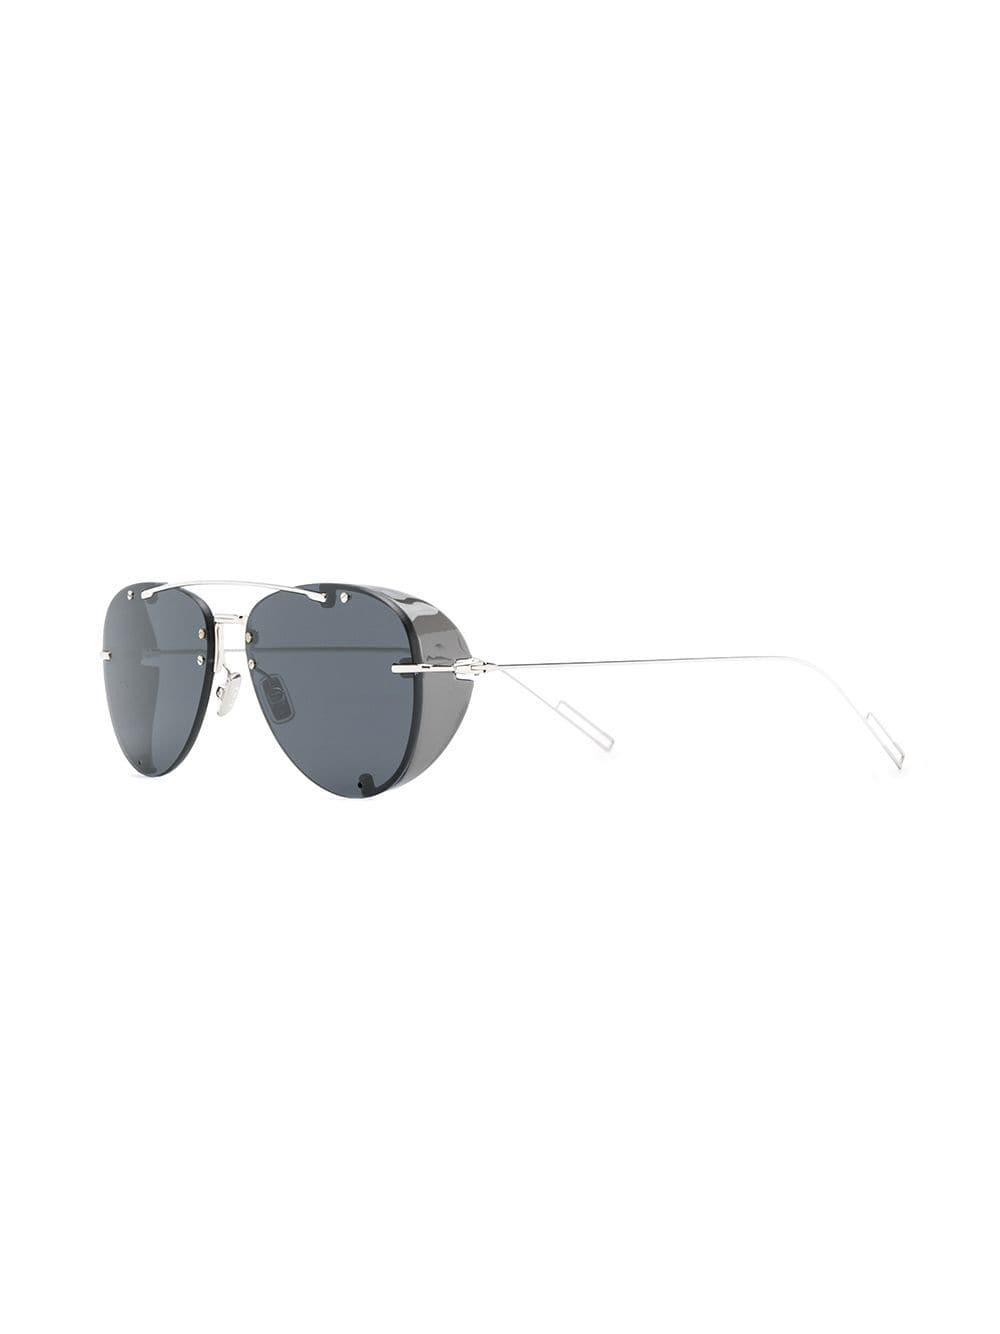 4b3a55073975 Dior Chroma 1 Aviator Sunglasses in Black for Men - Lyst